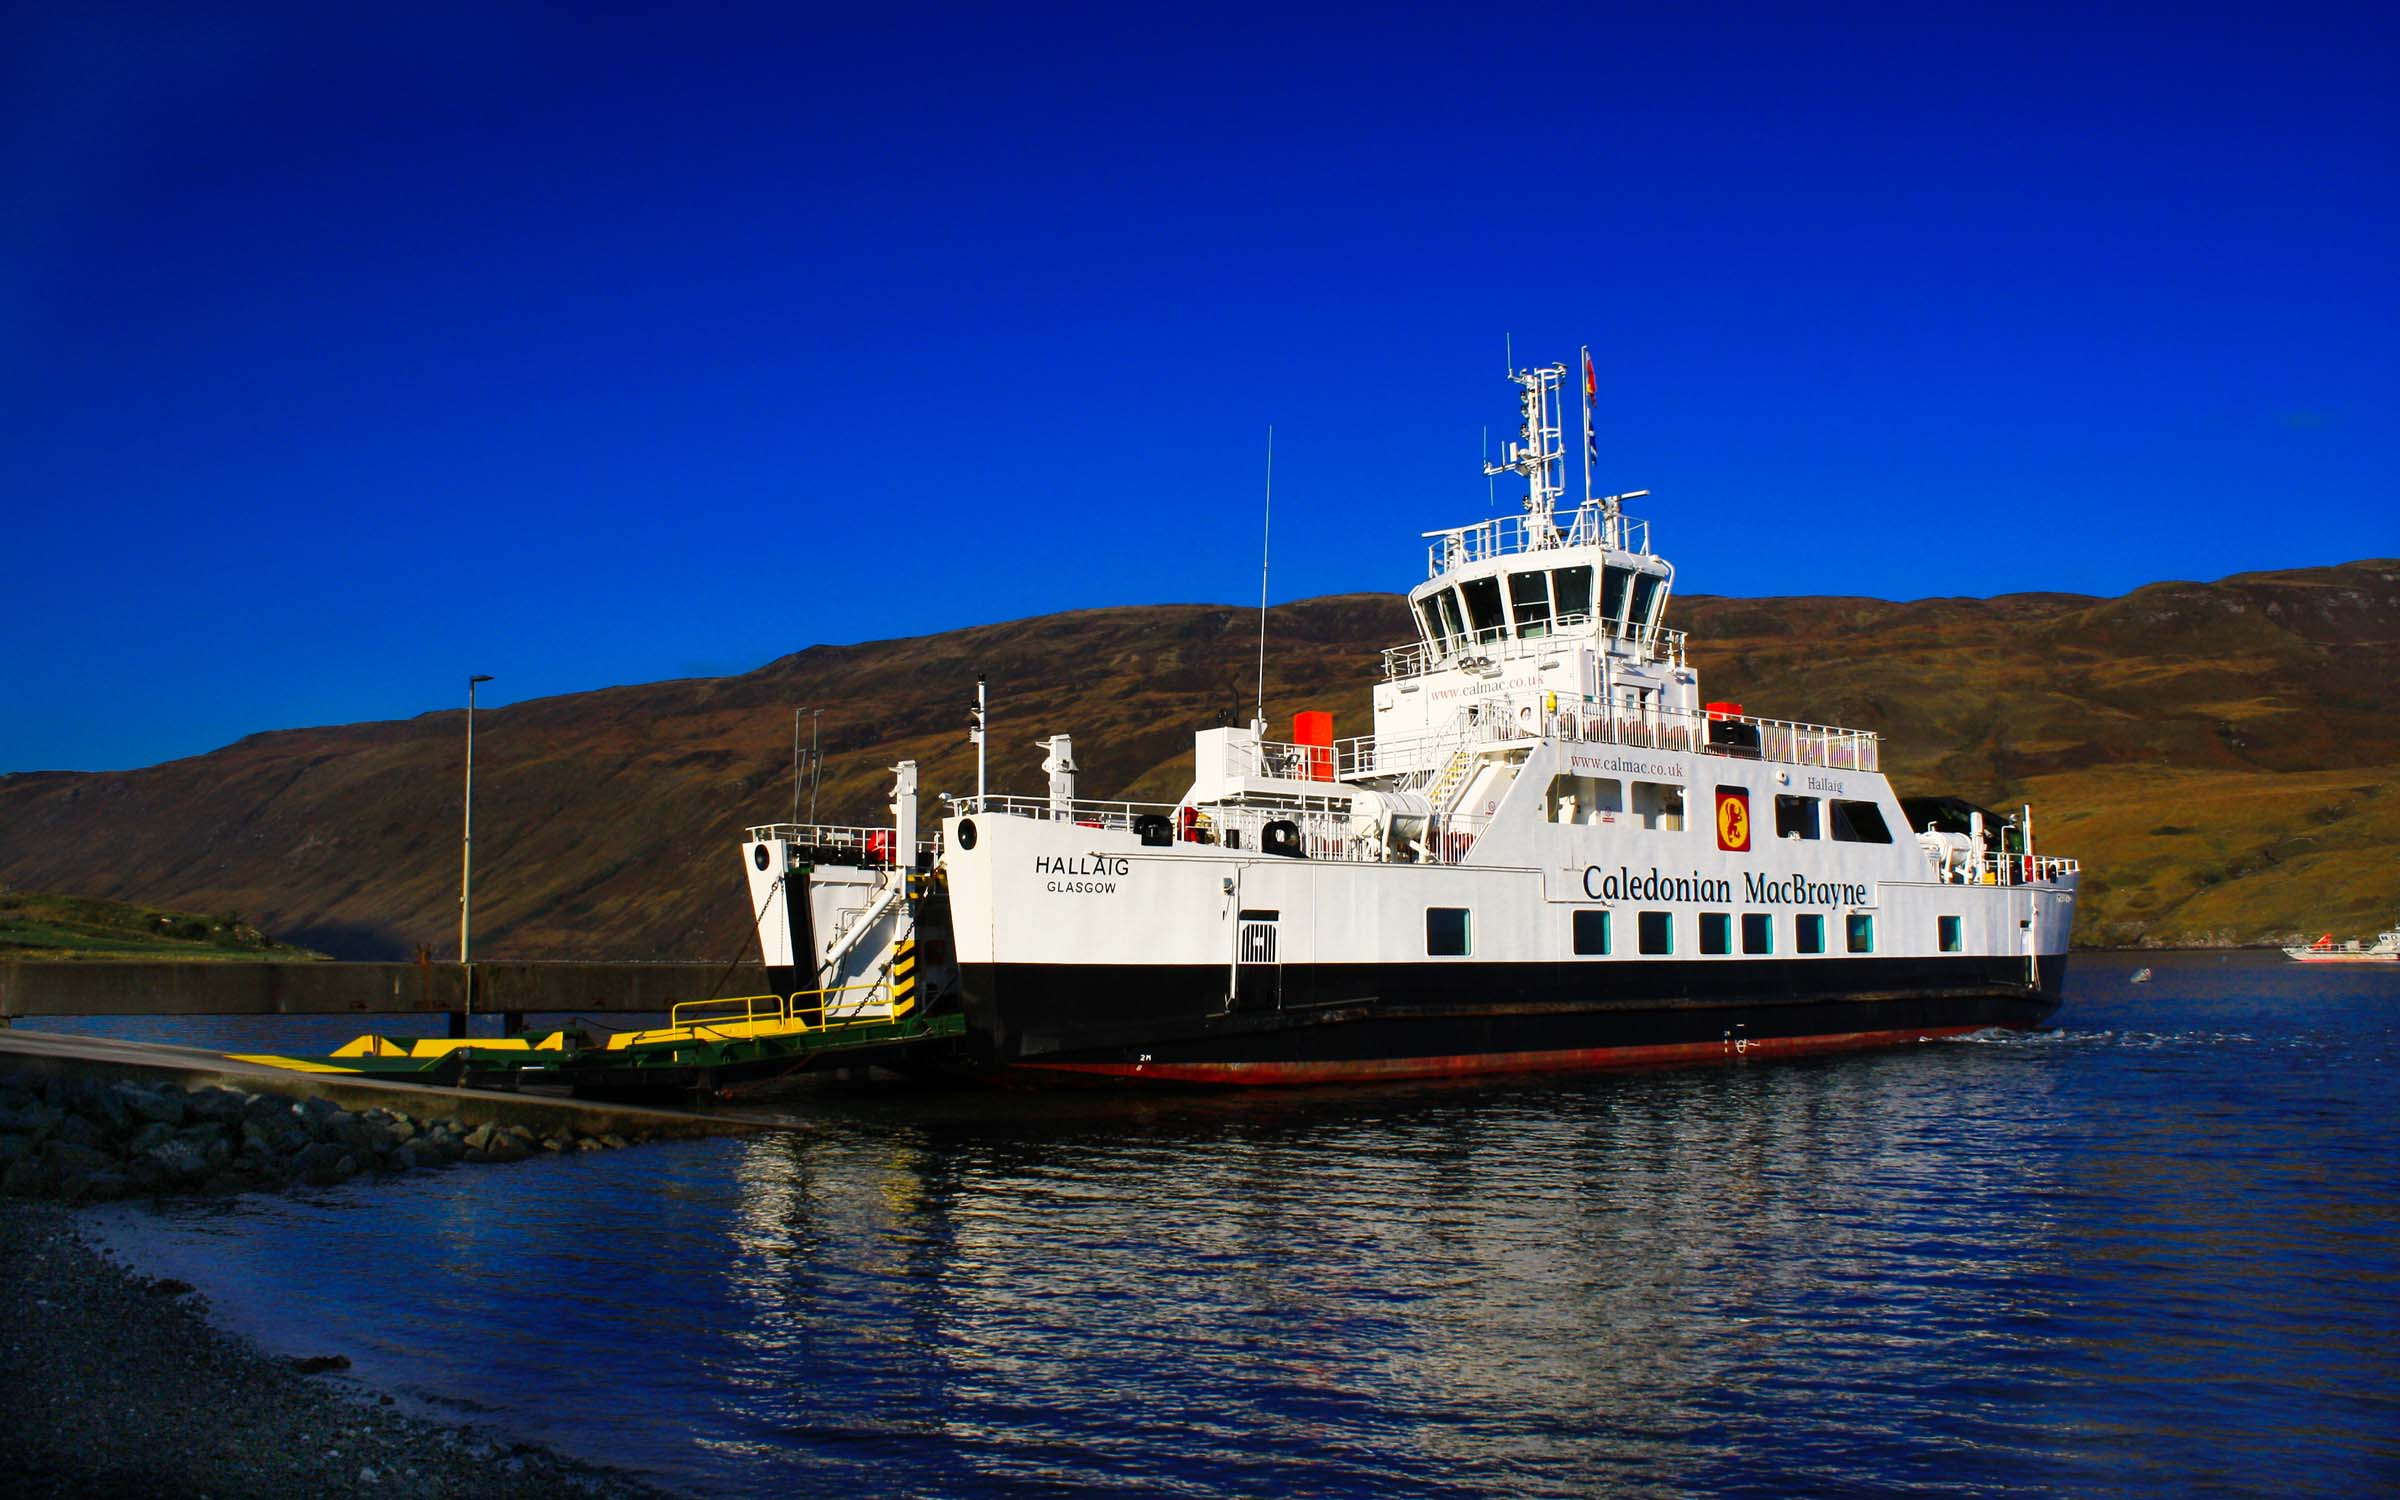 Hallaig lying at Sconser (Ships of CalMac)